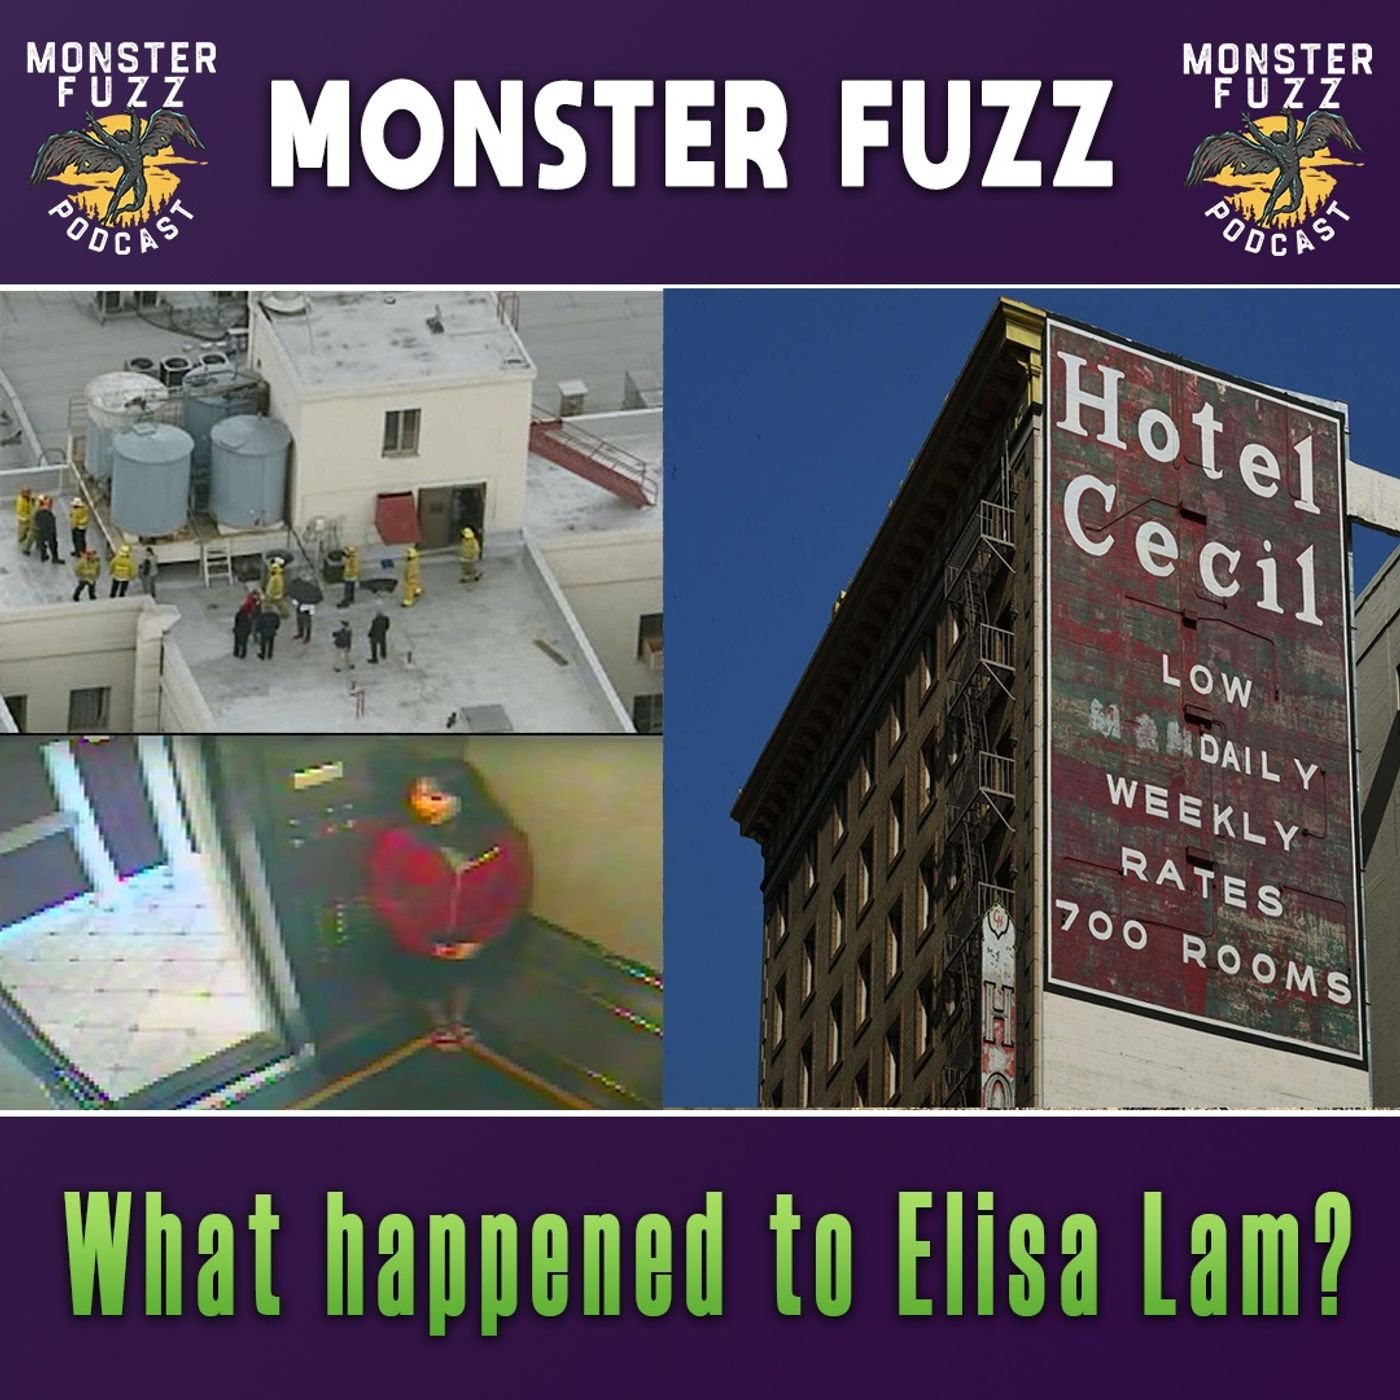 What happened to Elisa Lam?